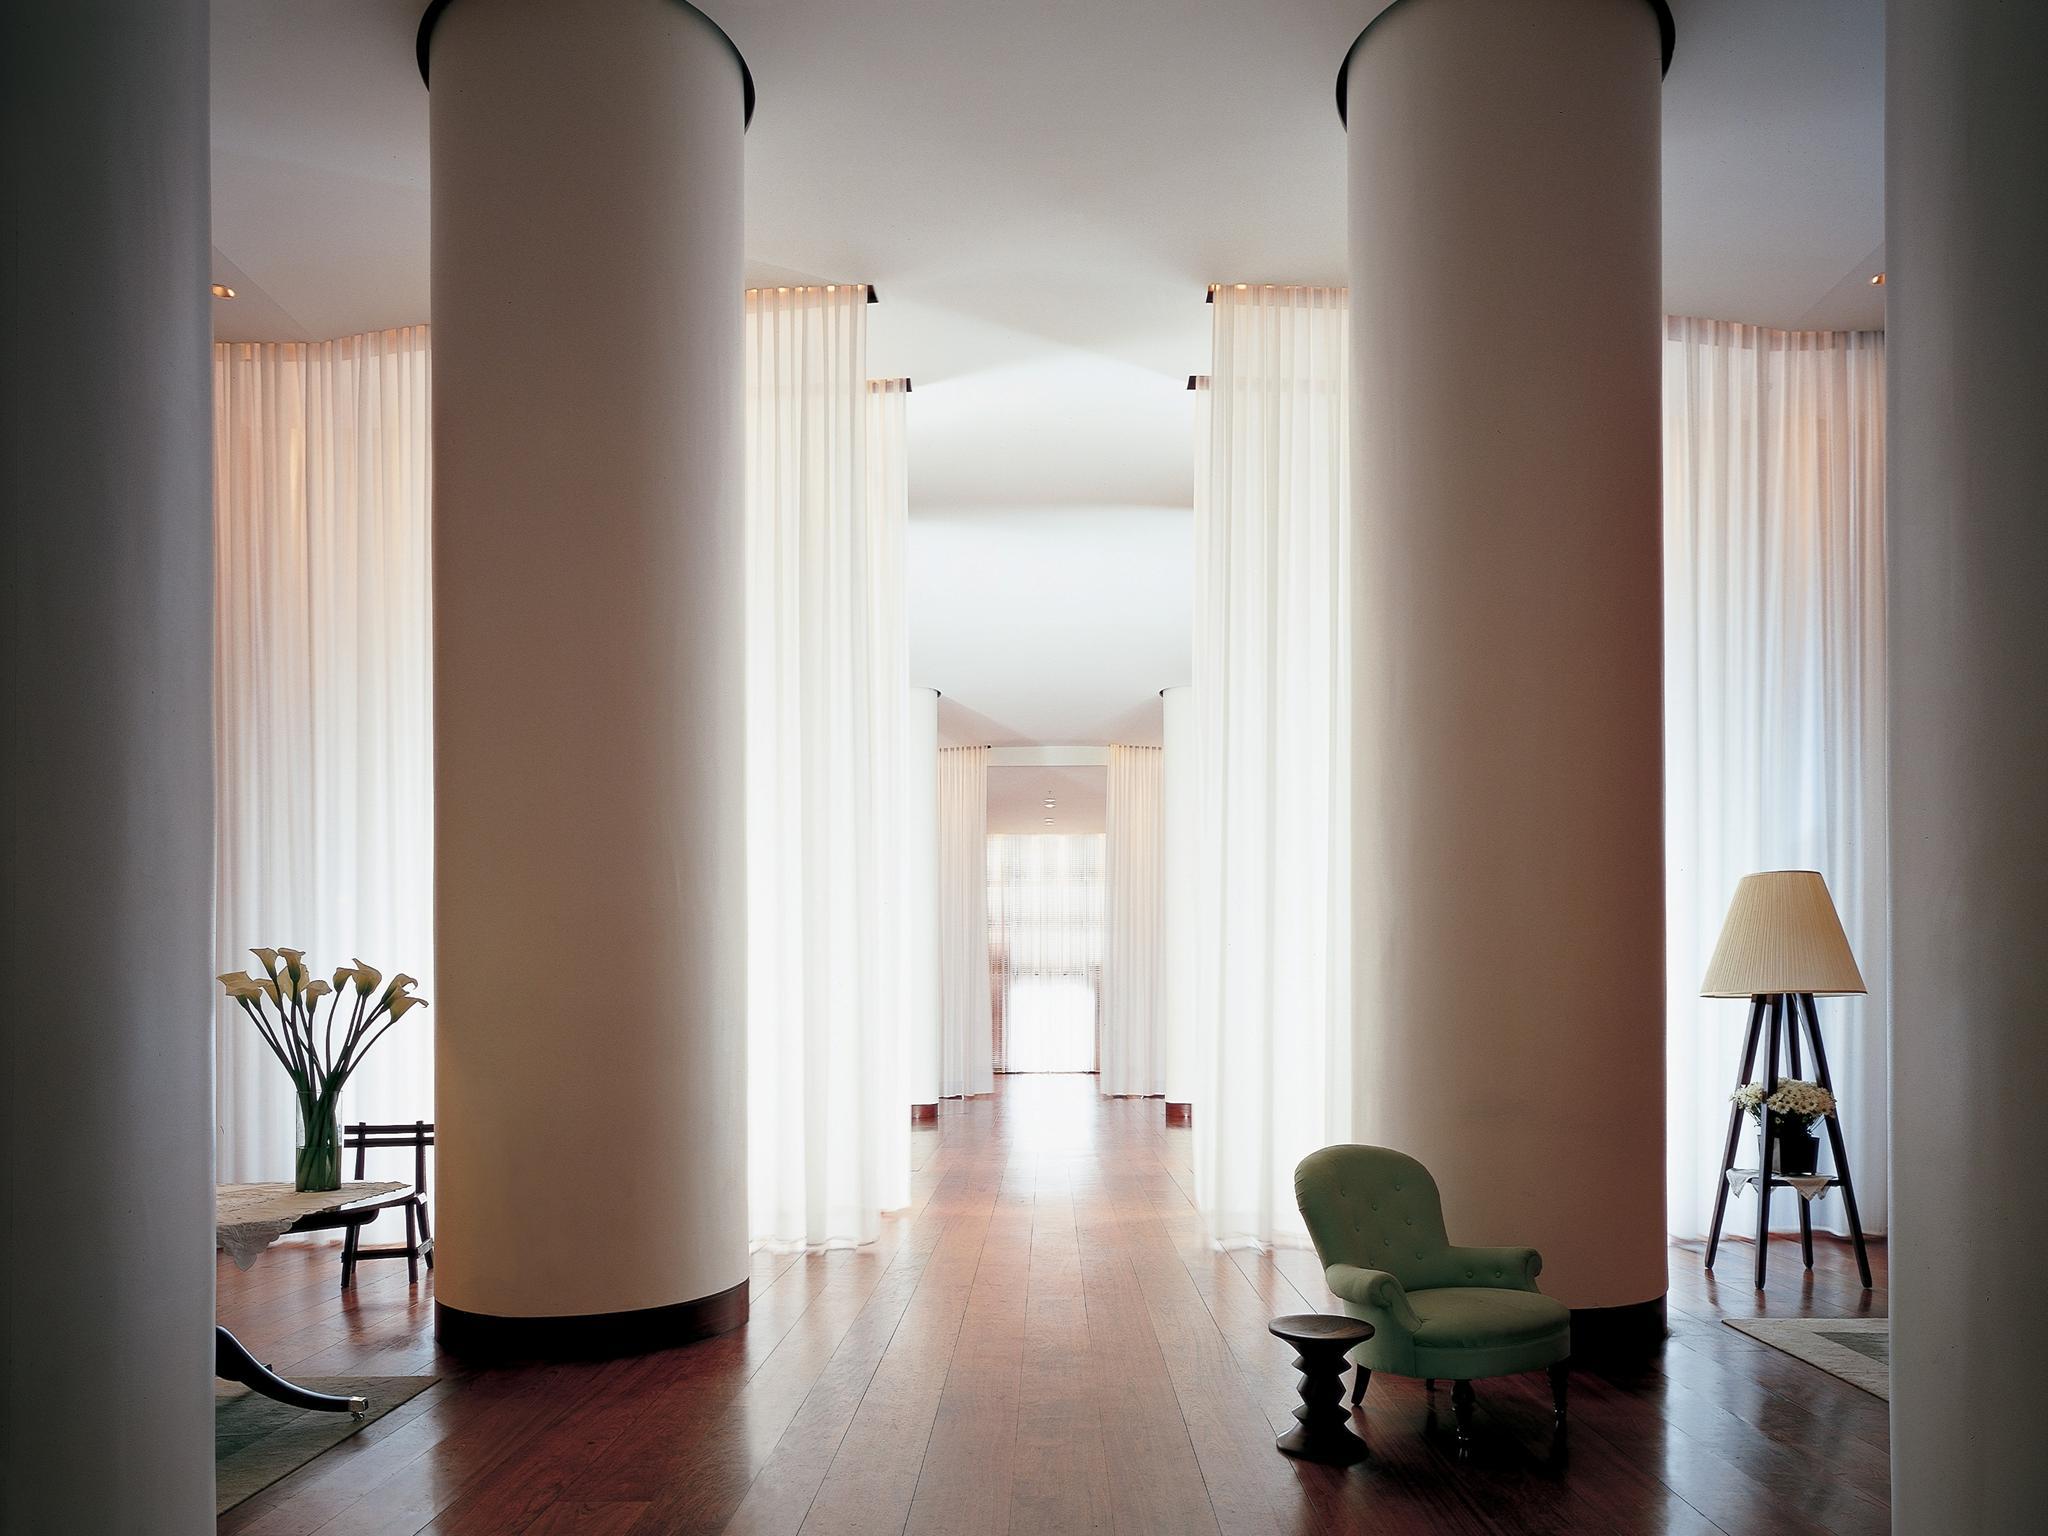 Hotel Foyer Or Lobby : Delano hotel miami beach the trendy guide